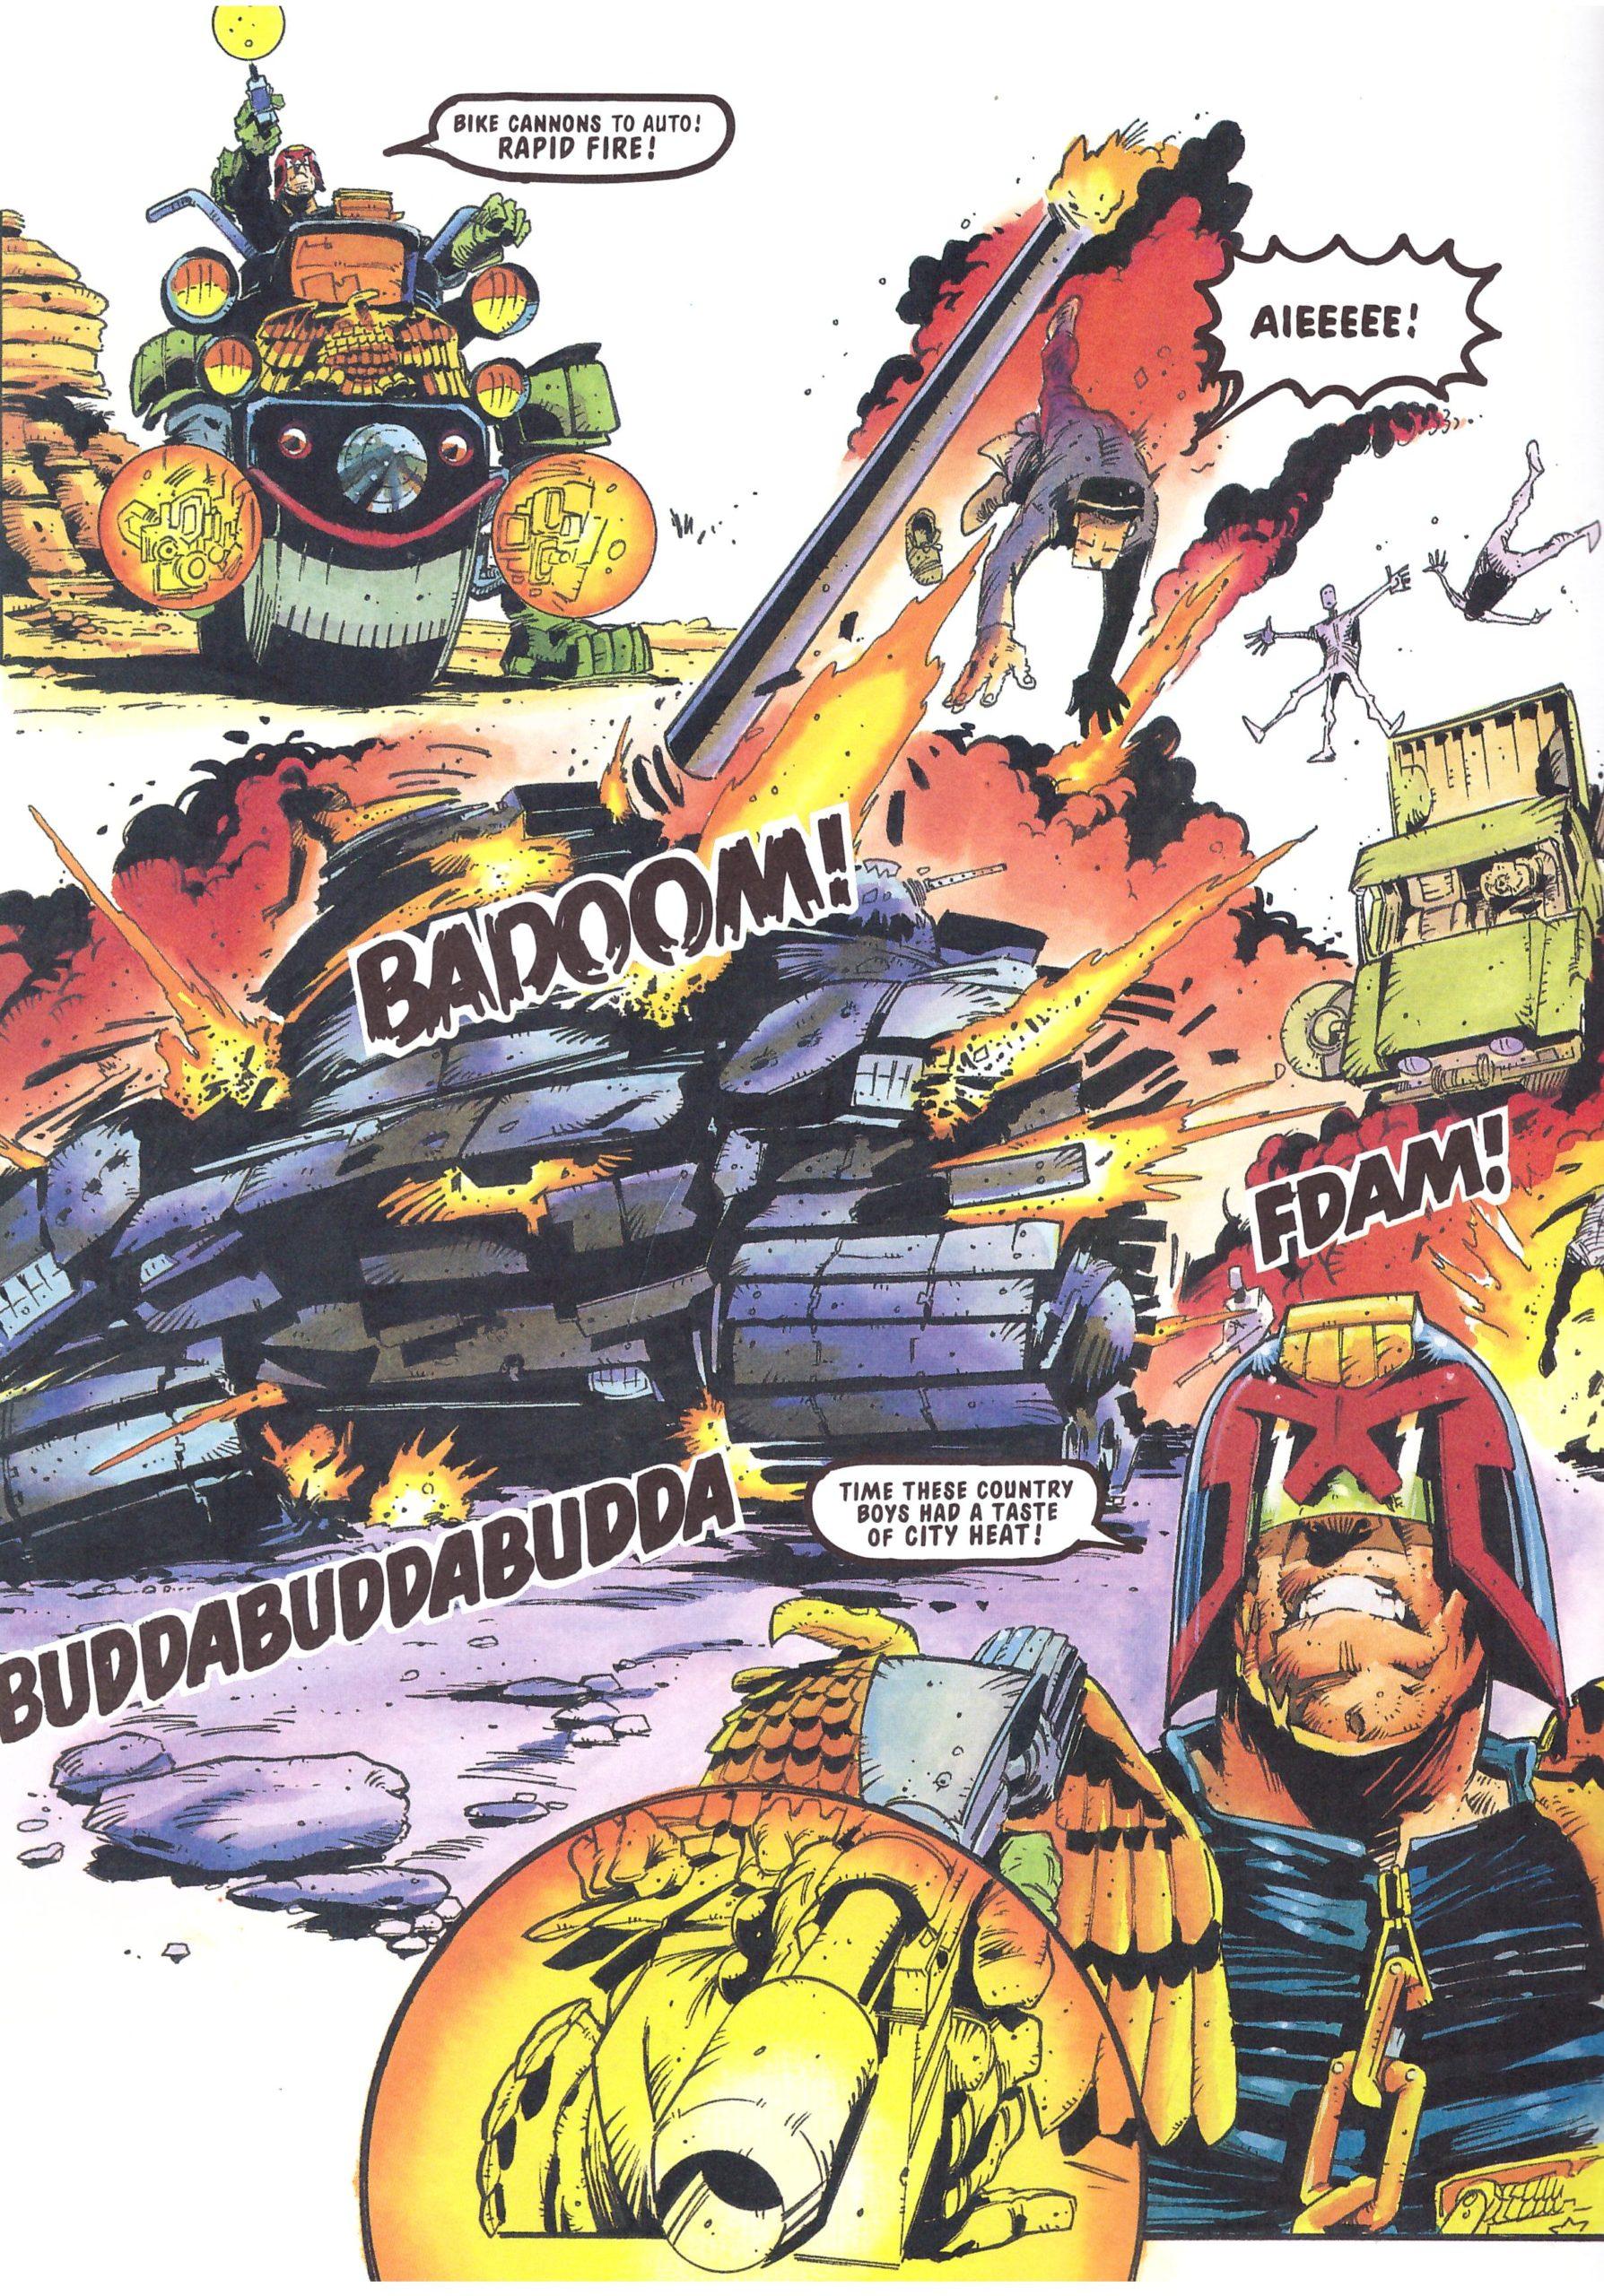 Judge Dredd The Three Amigos review